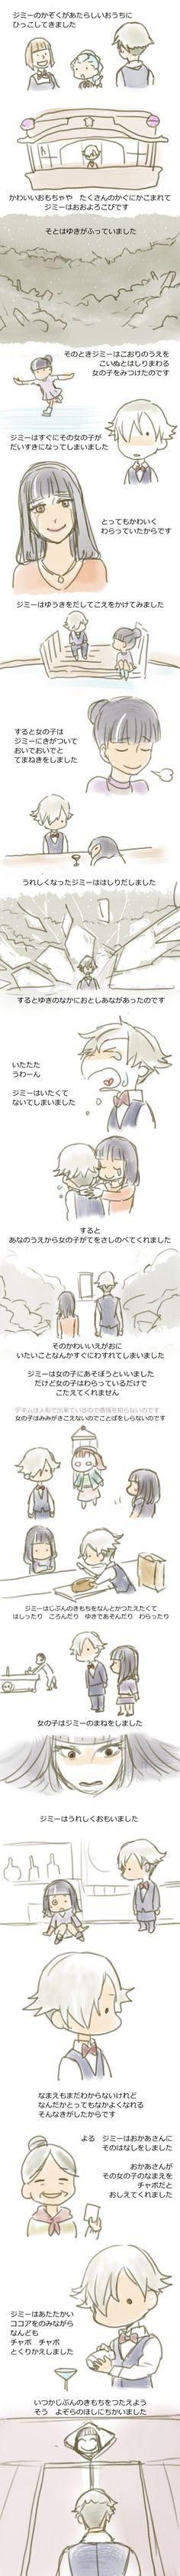 Death Parade chibi anime summary comic fan art Chiyuki x Decim from Pixiv